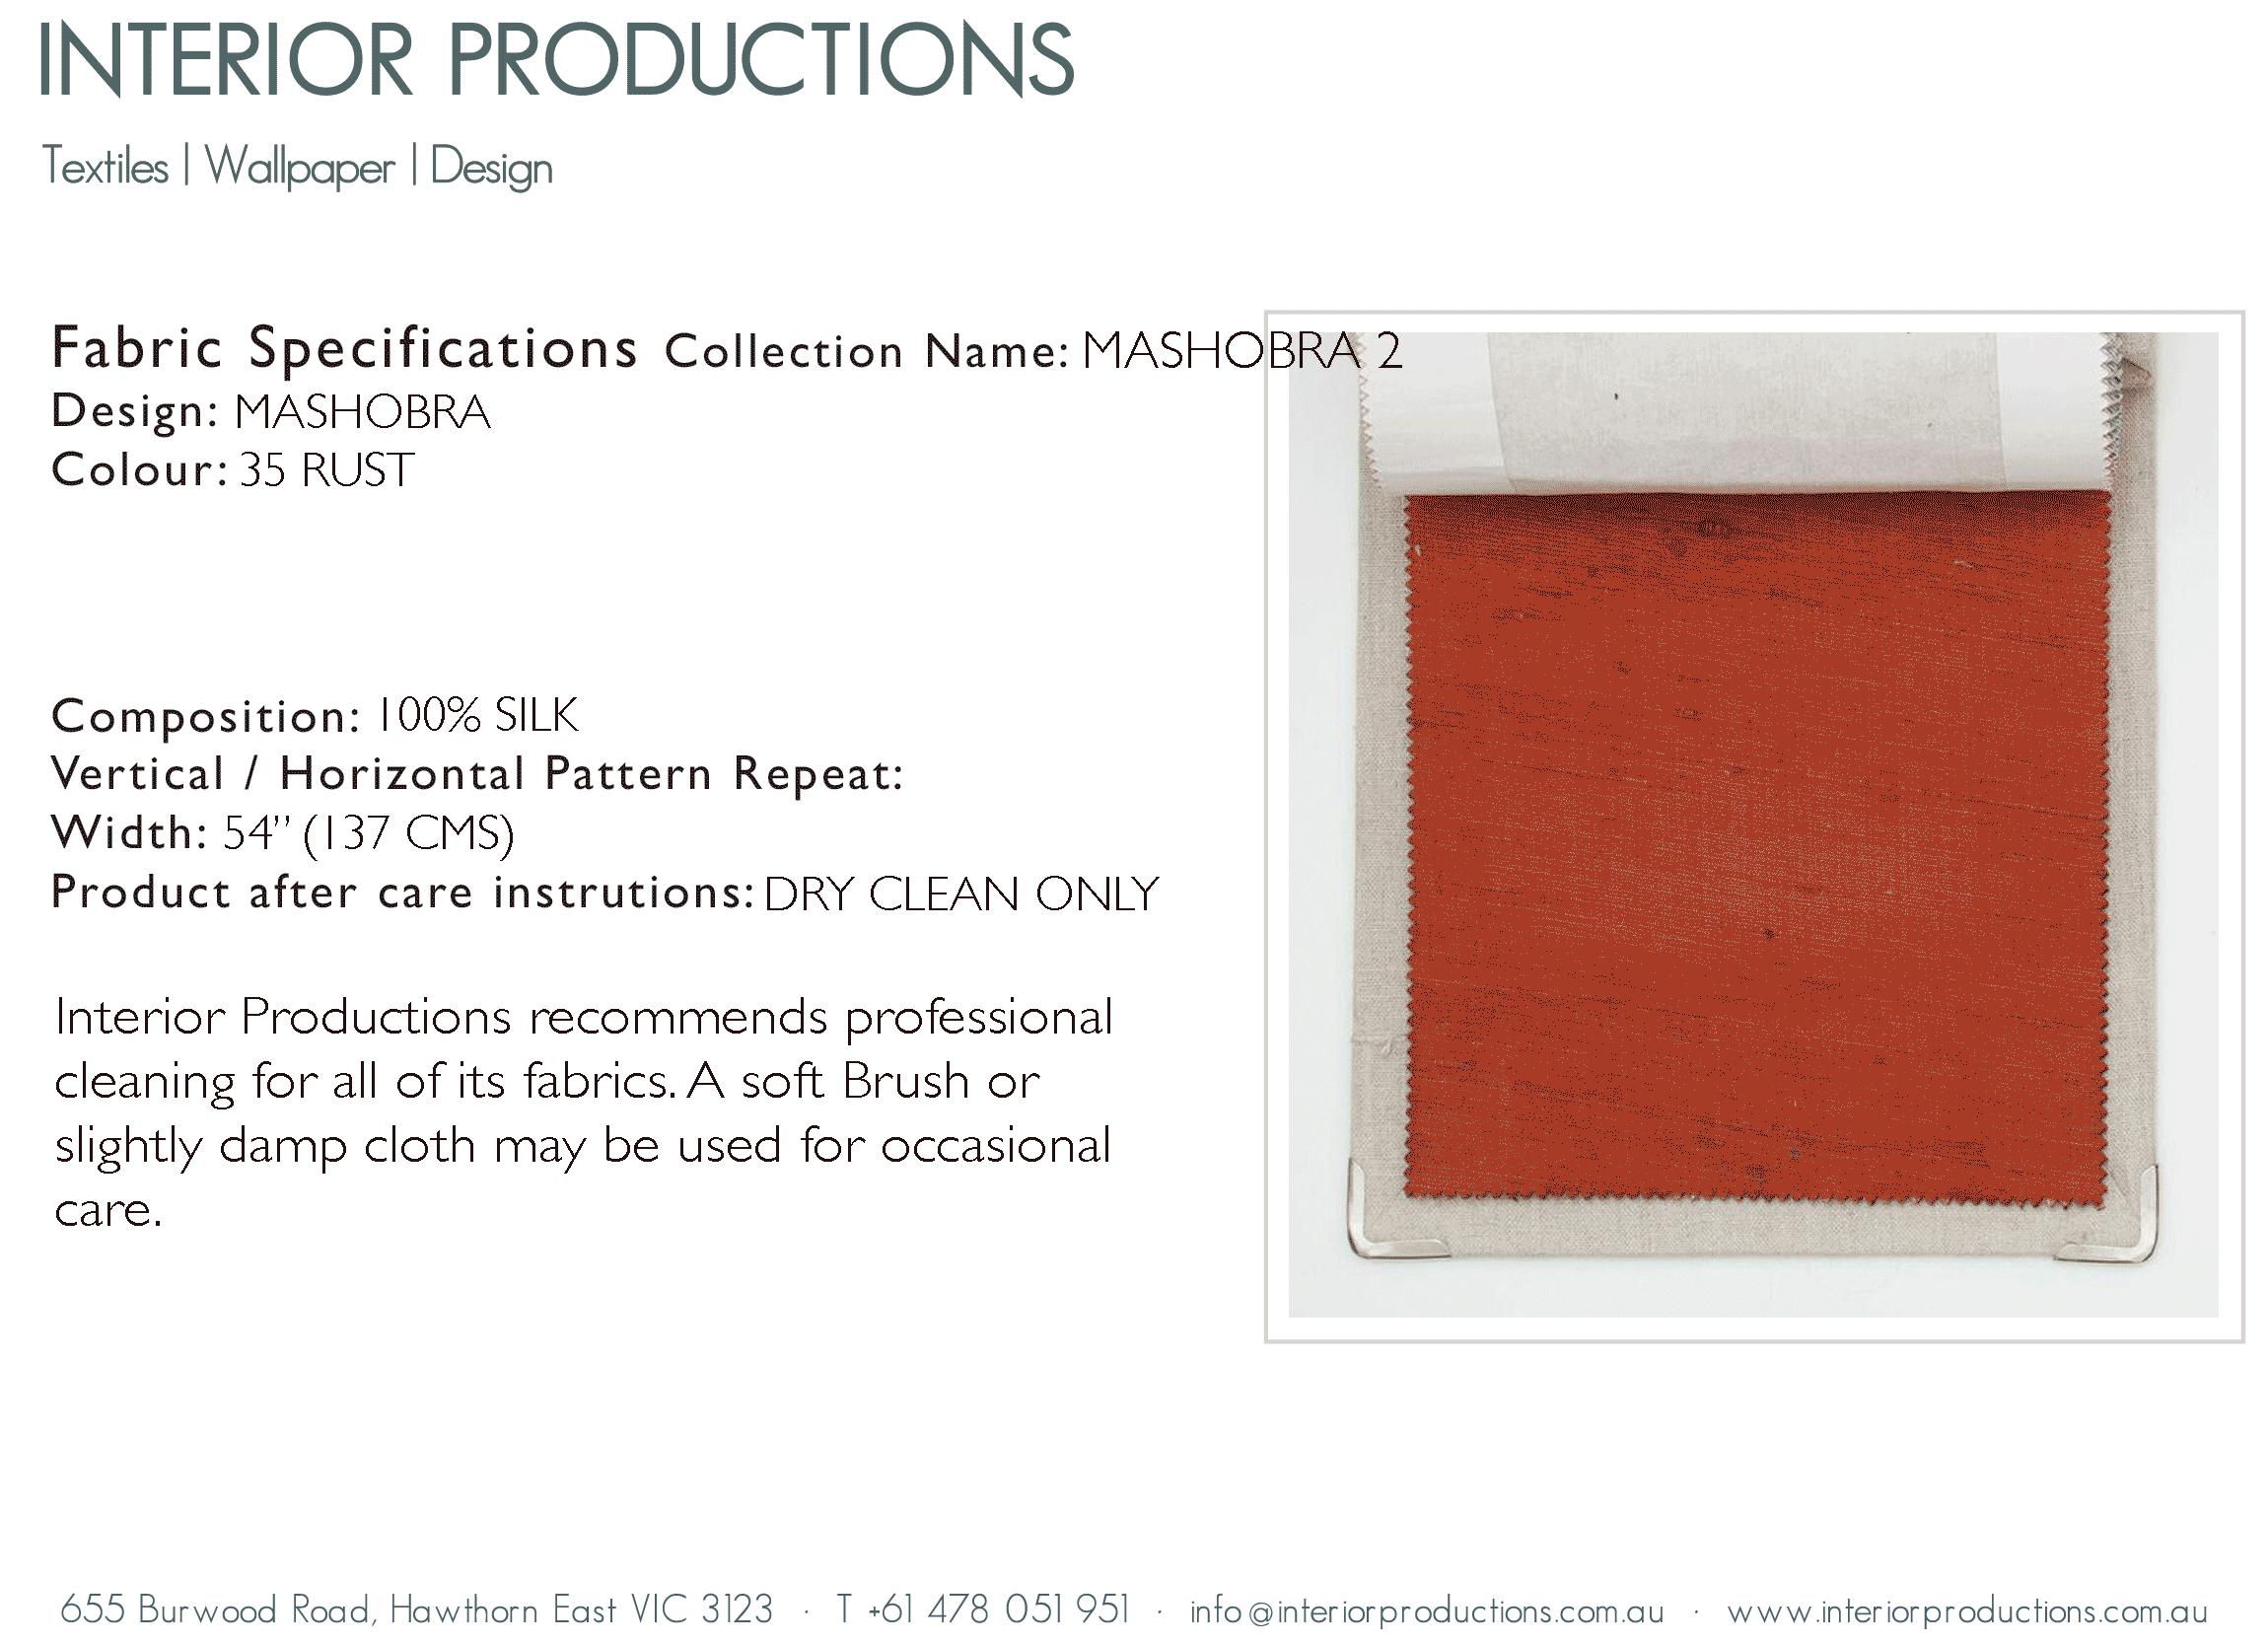 interior_productions_MASHOBRA---35-RUST